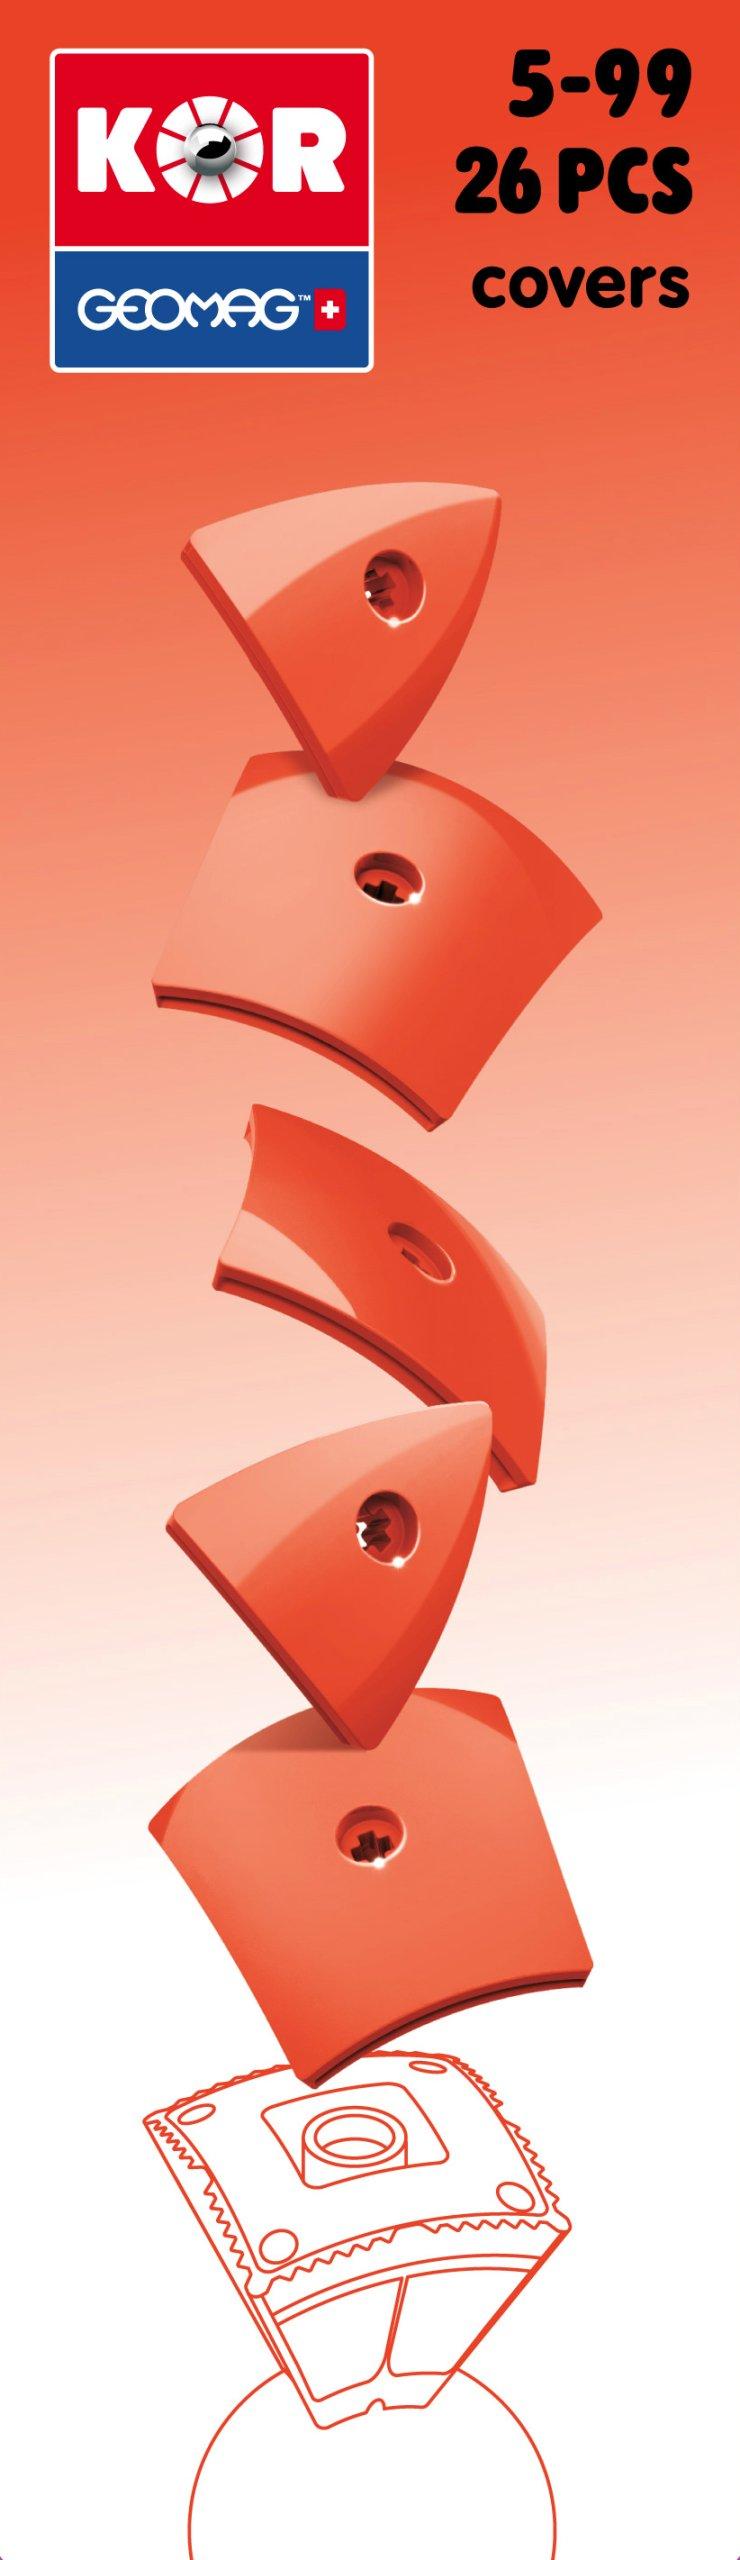 Geomag KOR 2 0 Pantone 485 (bright red) - COVER - 7173198525